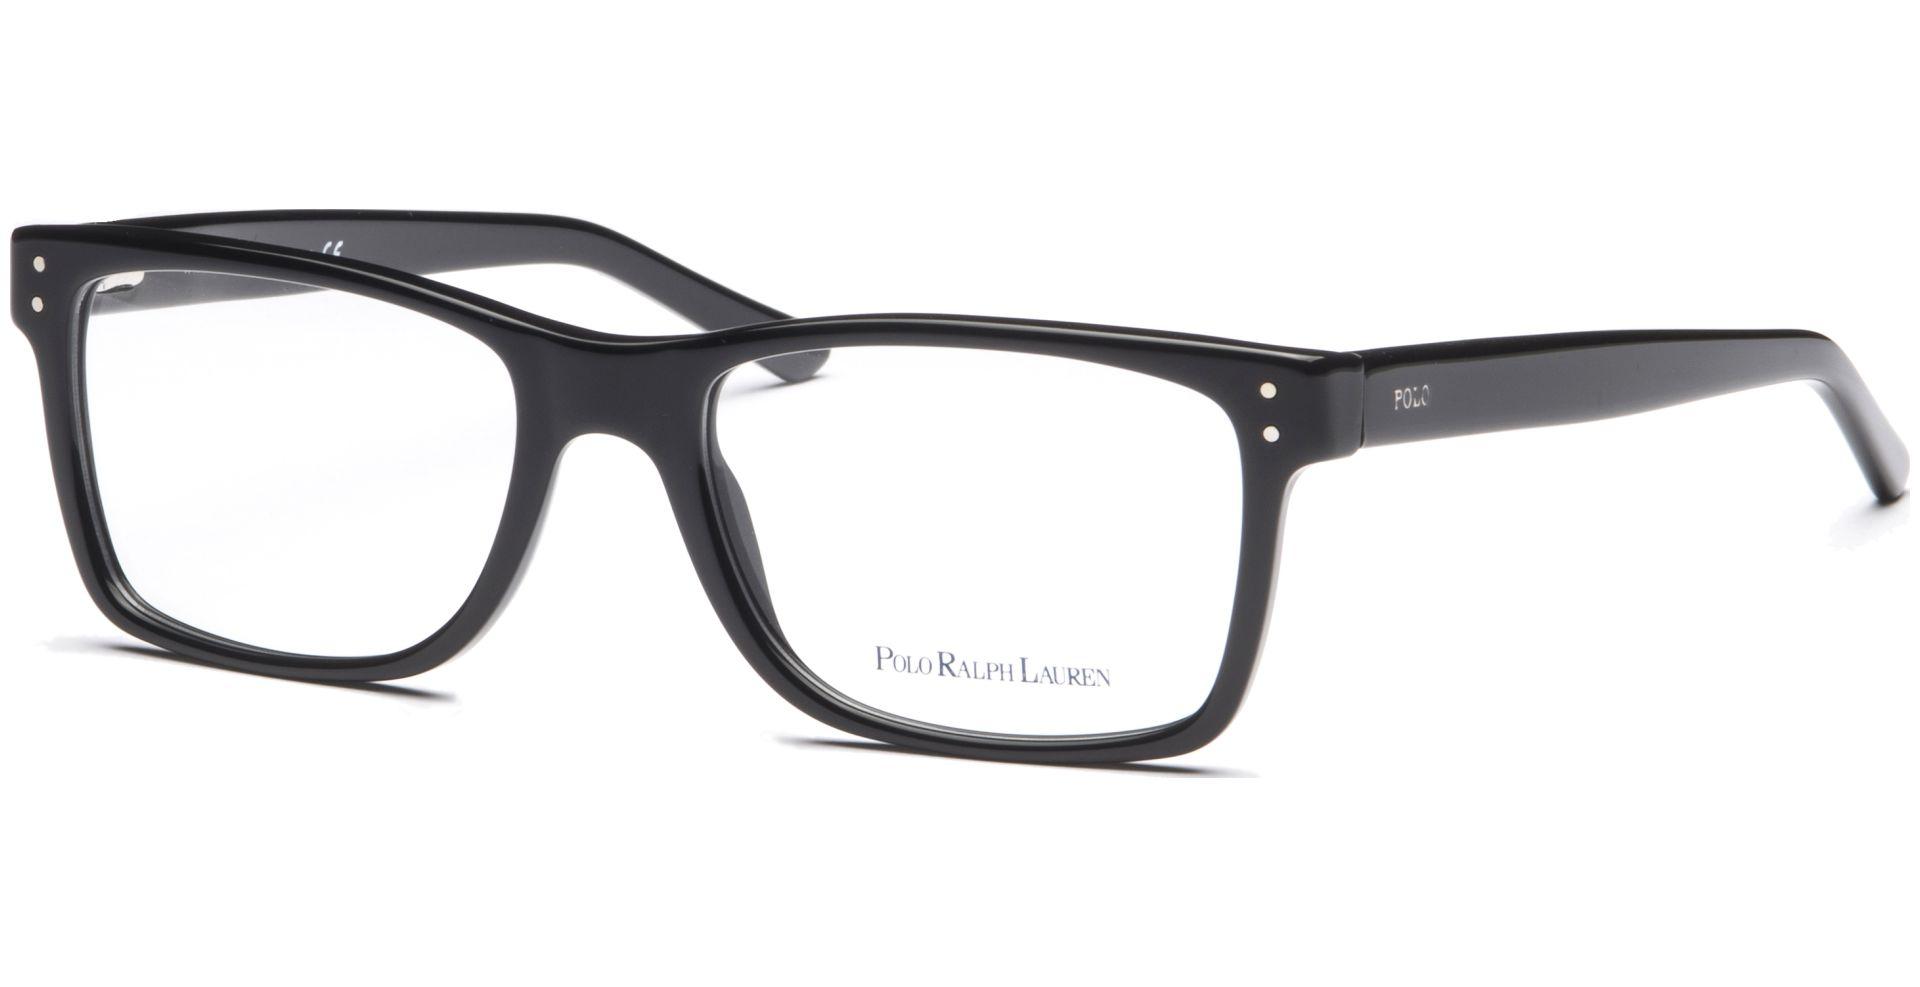 Polo - Ralph Lauren - PH2057 5001 5318 Small Shiny Black - von ...